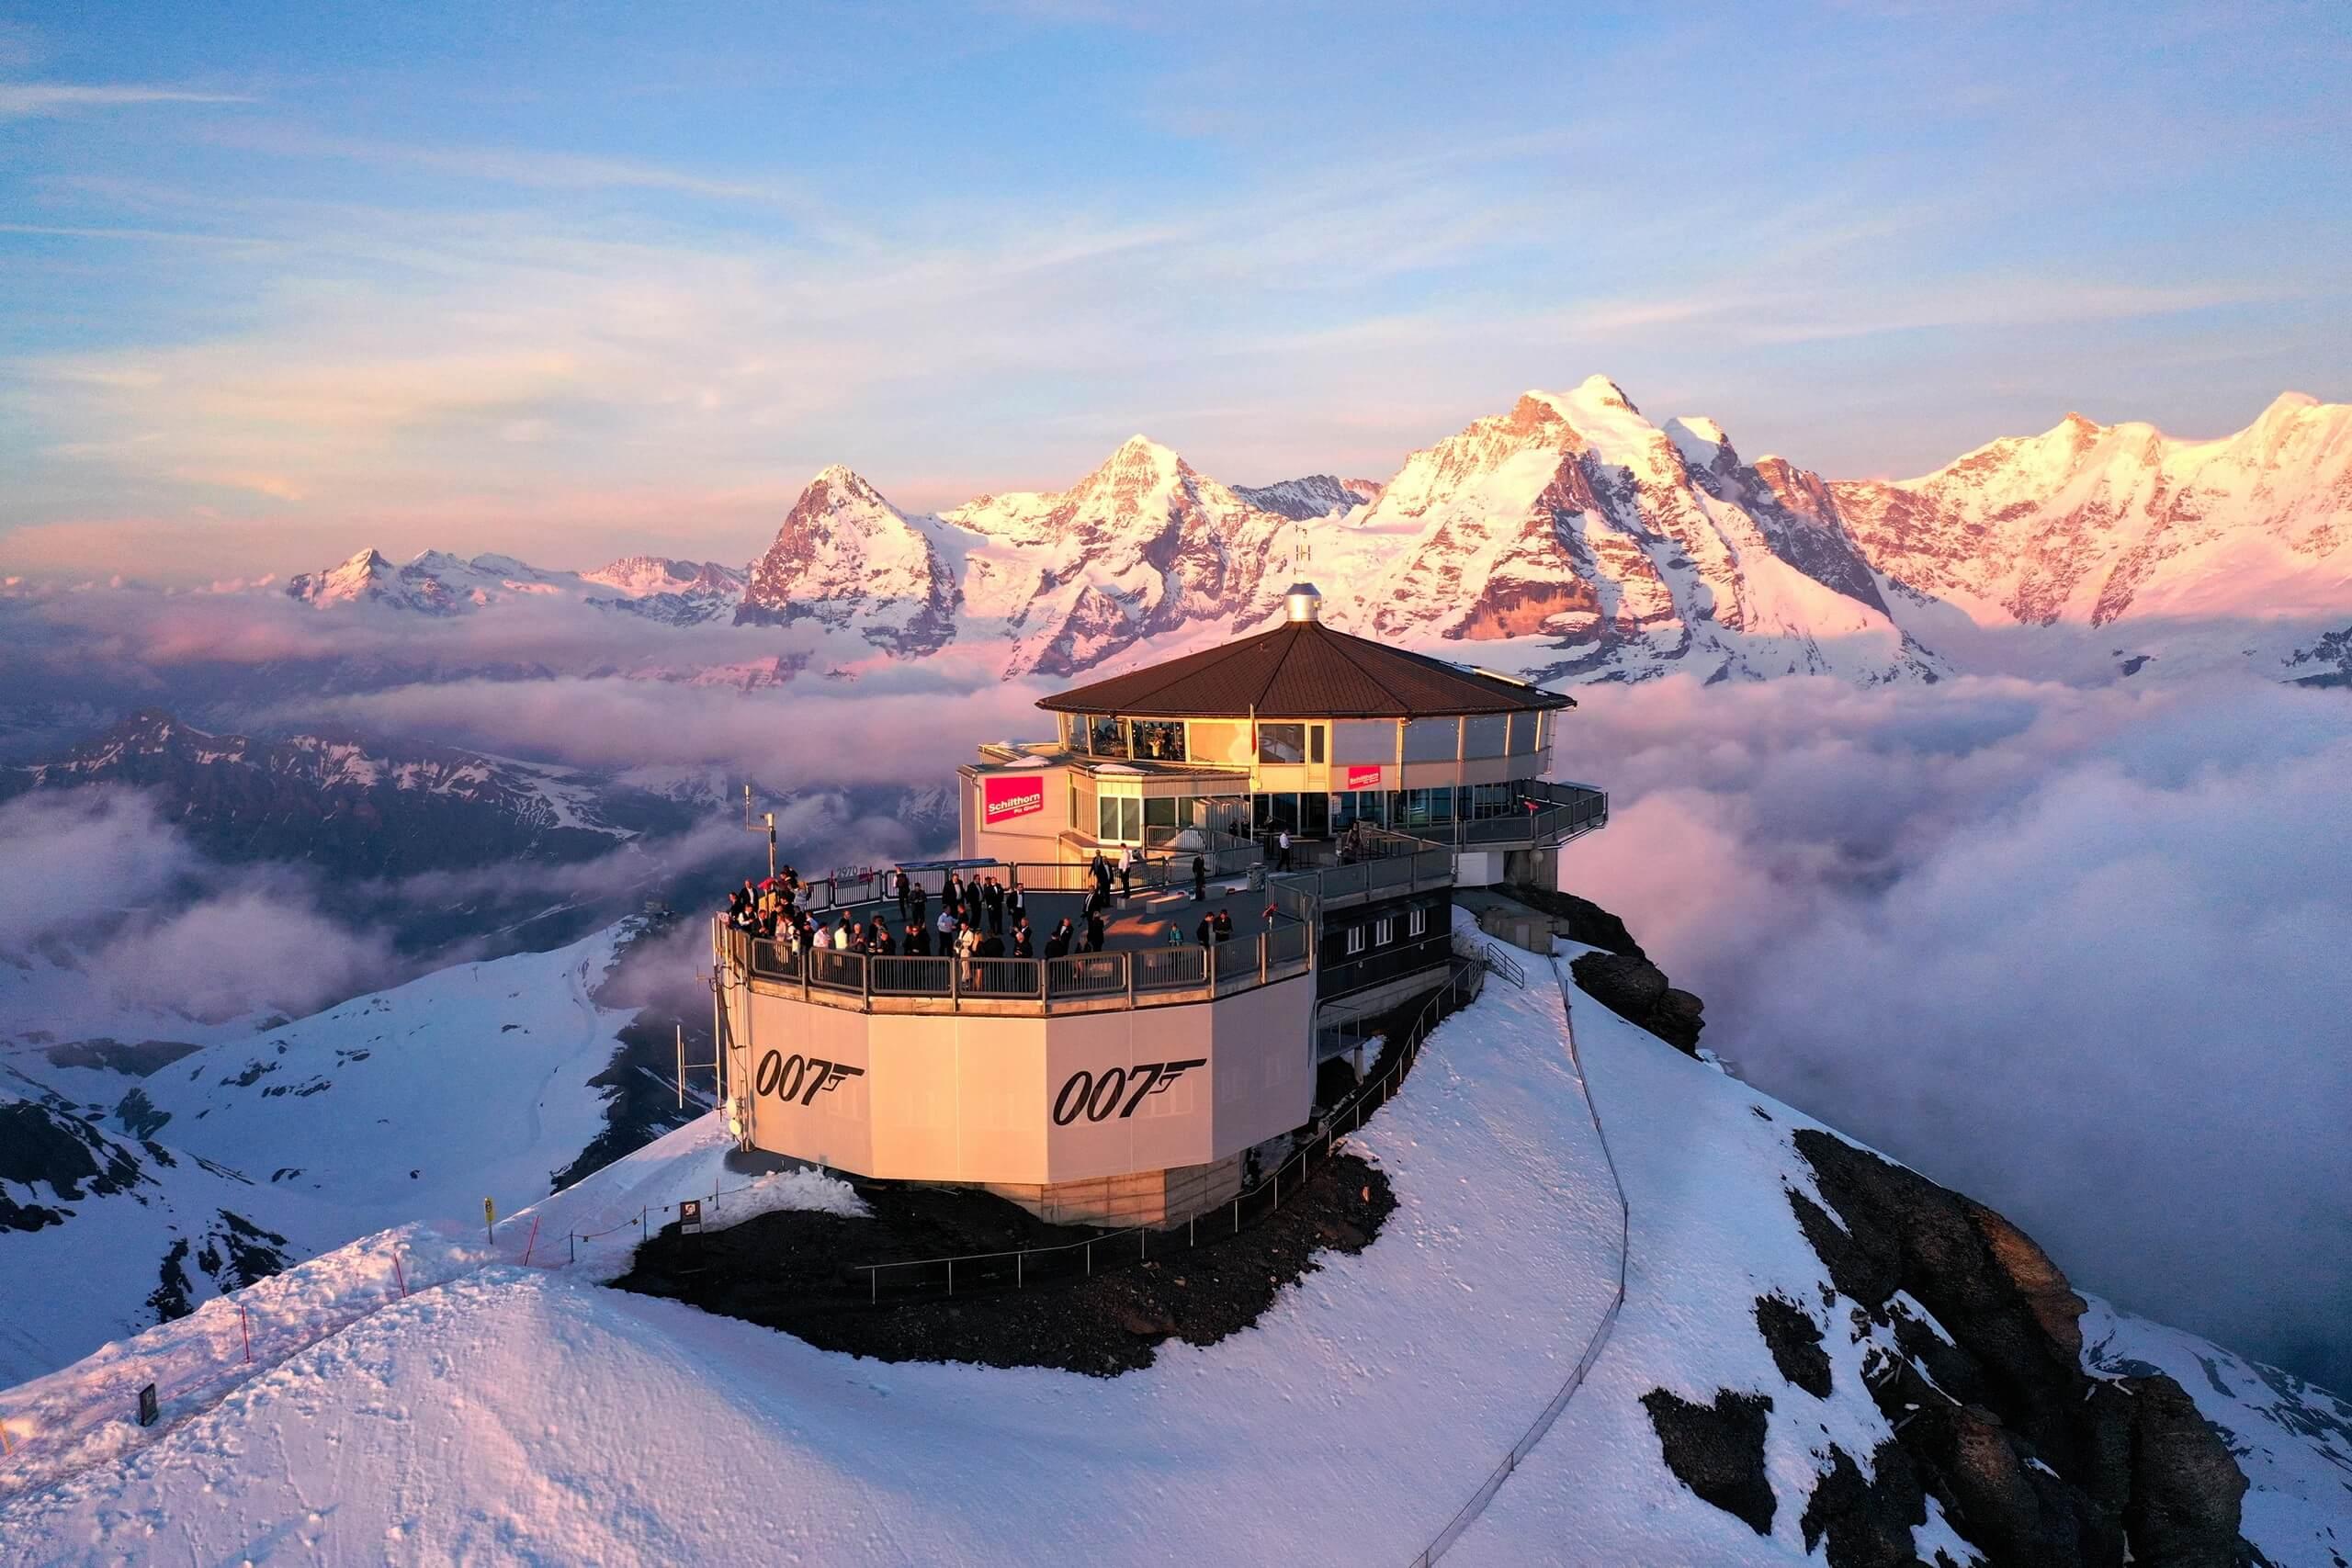 schilthorn-piz-gloria-sonneuntergang-abendstimmung-berge